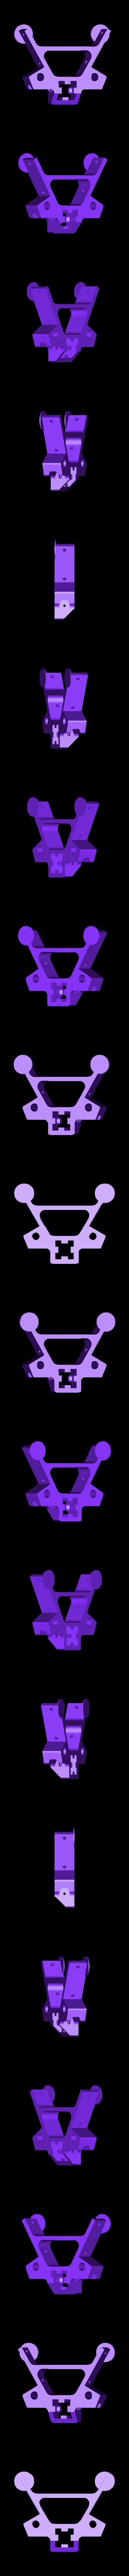 frame_top_M4_bolt.stl Télécharger fichier STL gratuit R/K Delta • Design imprimable en 3D, Tarkhubal